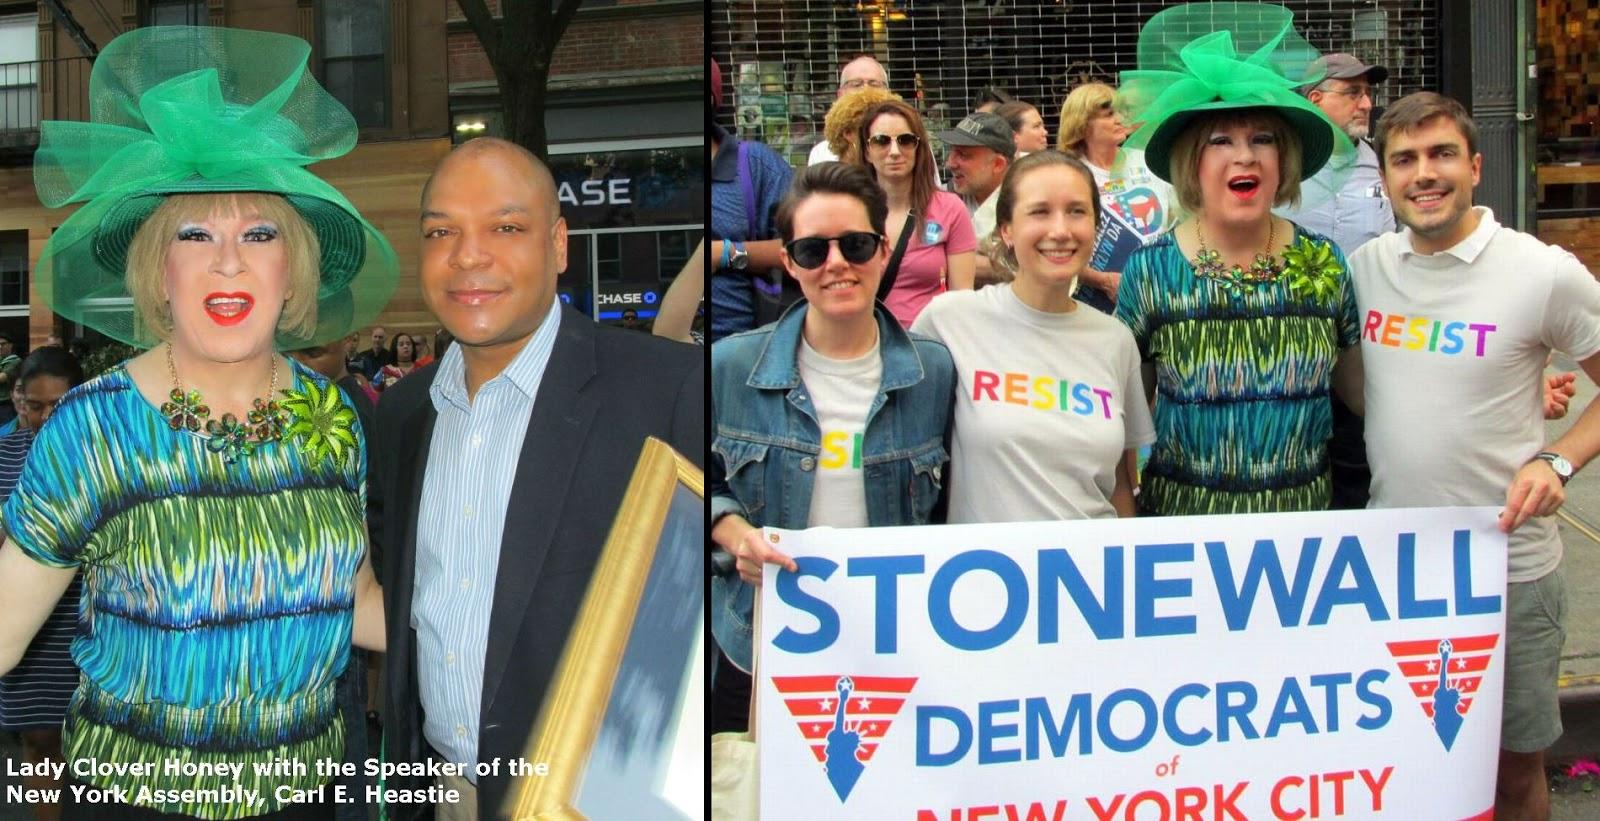 How Sweet It Is! Lady Clover Honey's Blog: Brooklyn LGBT